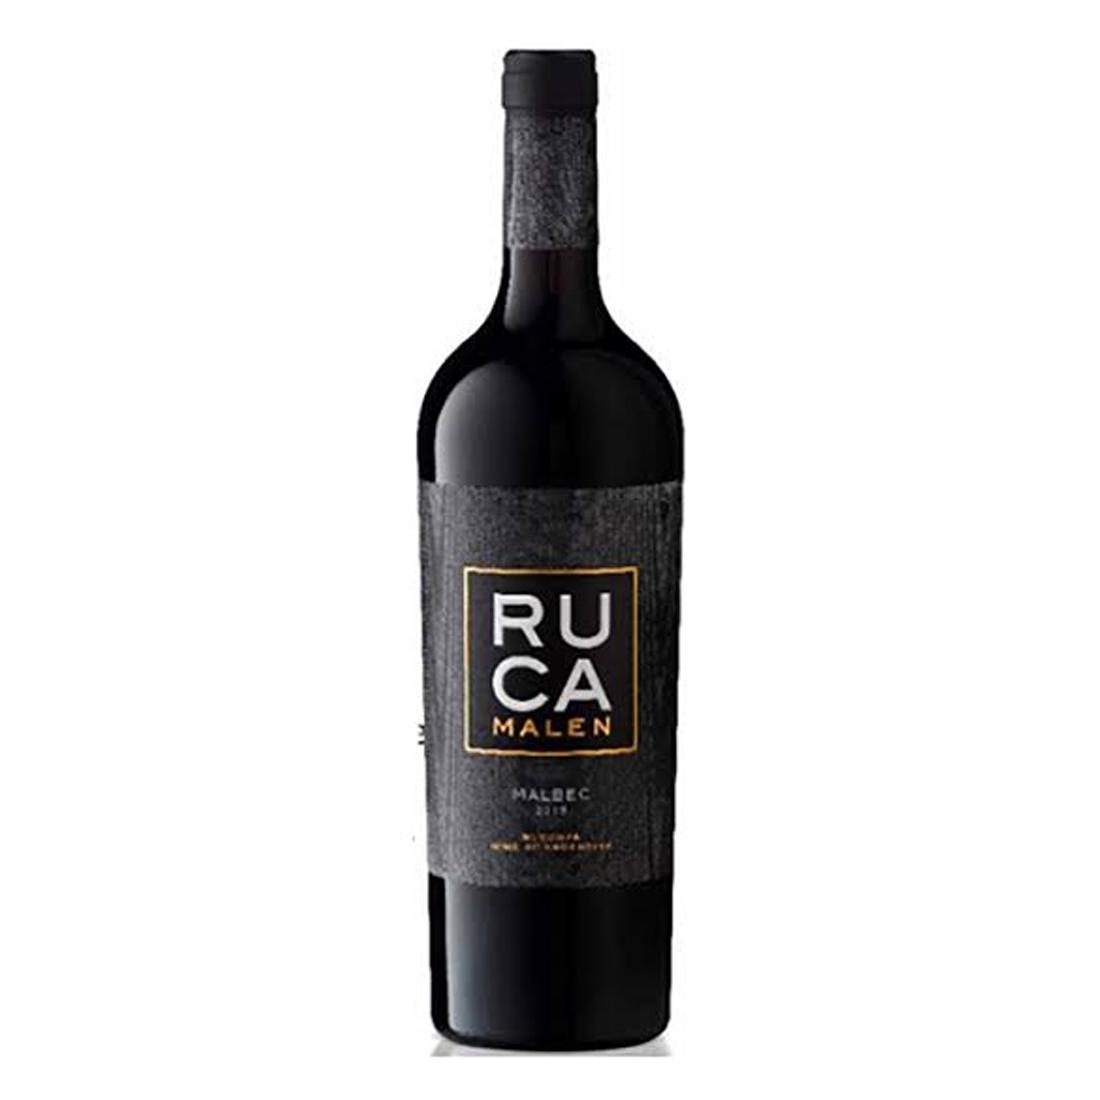 Vinho Ruca Malen Malbec 750 ml